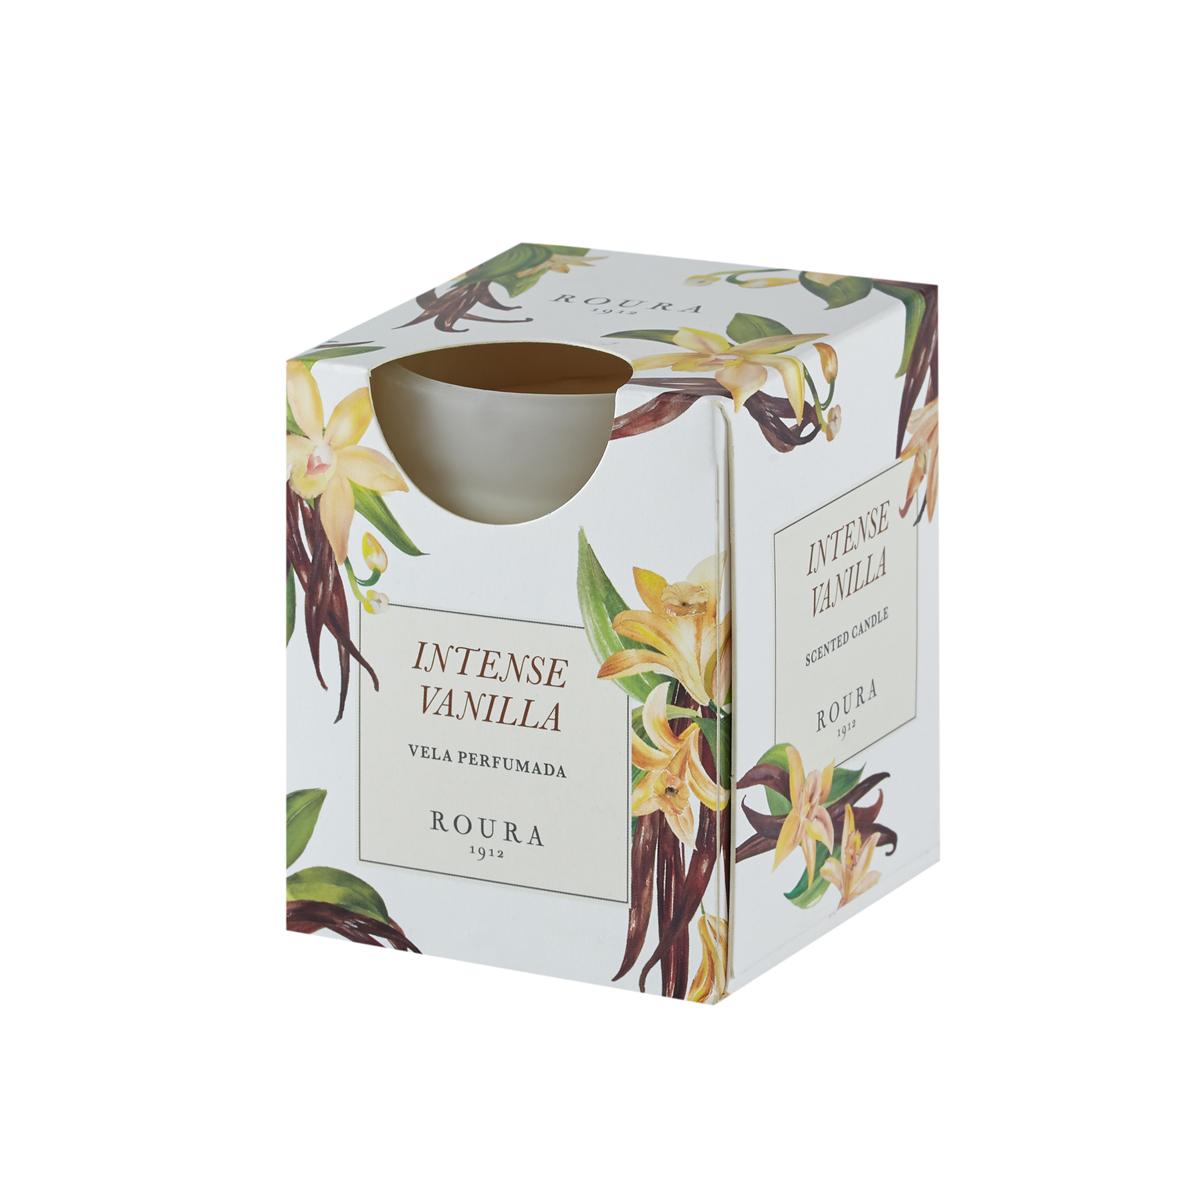 Фото - Свеча ароматическая Roura VANILLA 333033.170 ароматическая свеча lavender vanilla лаванда и ваниль свеча 680г